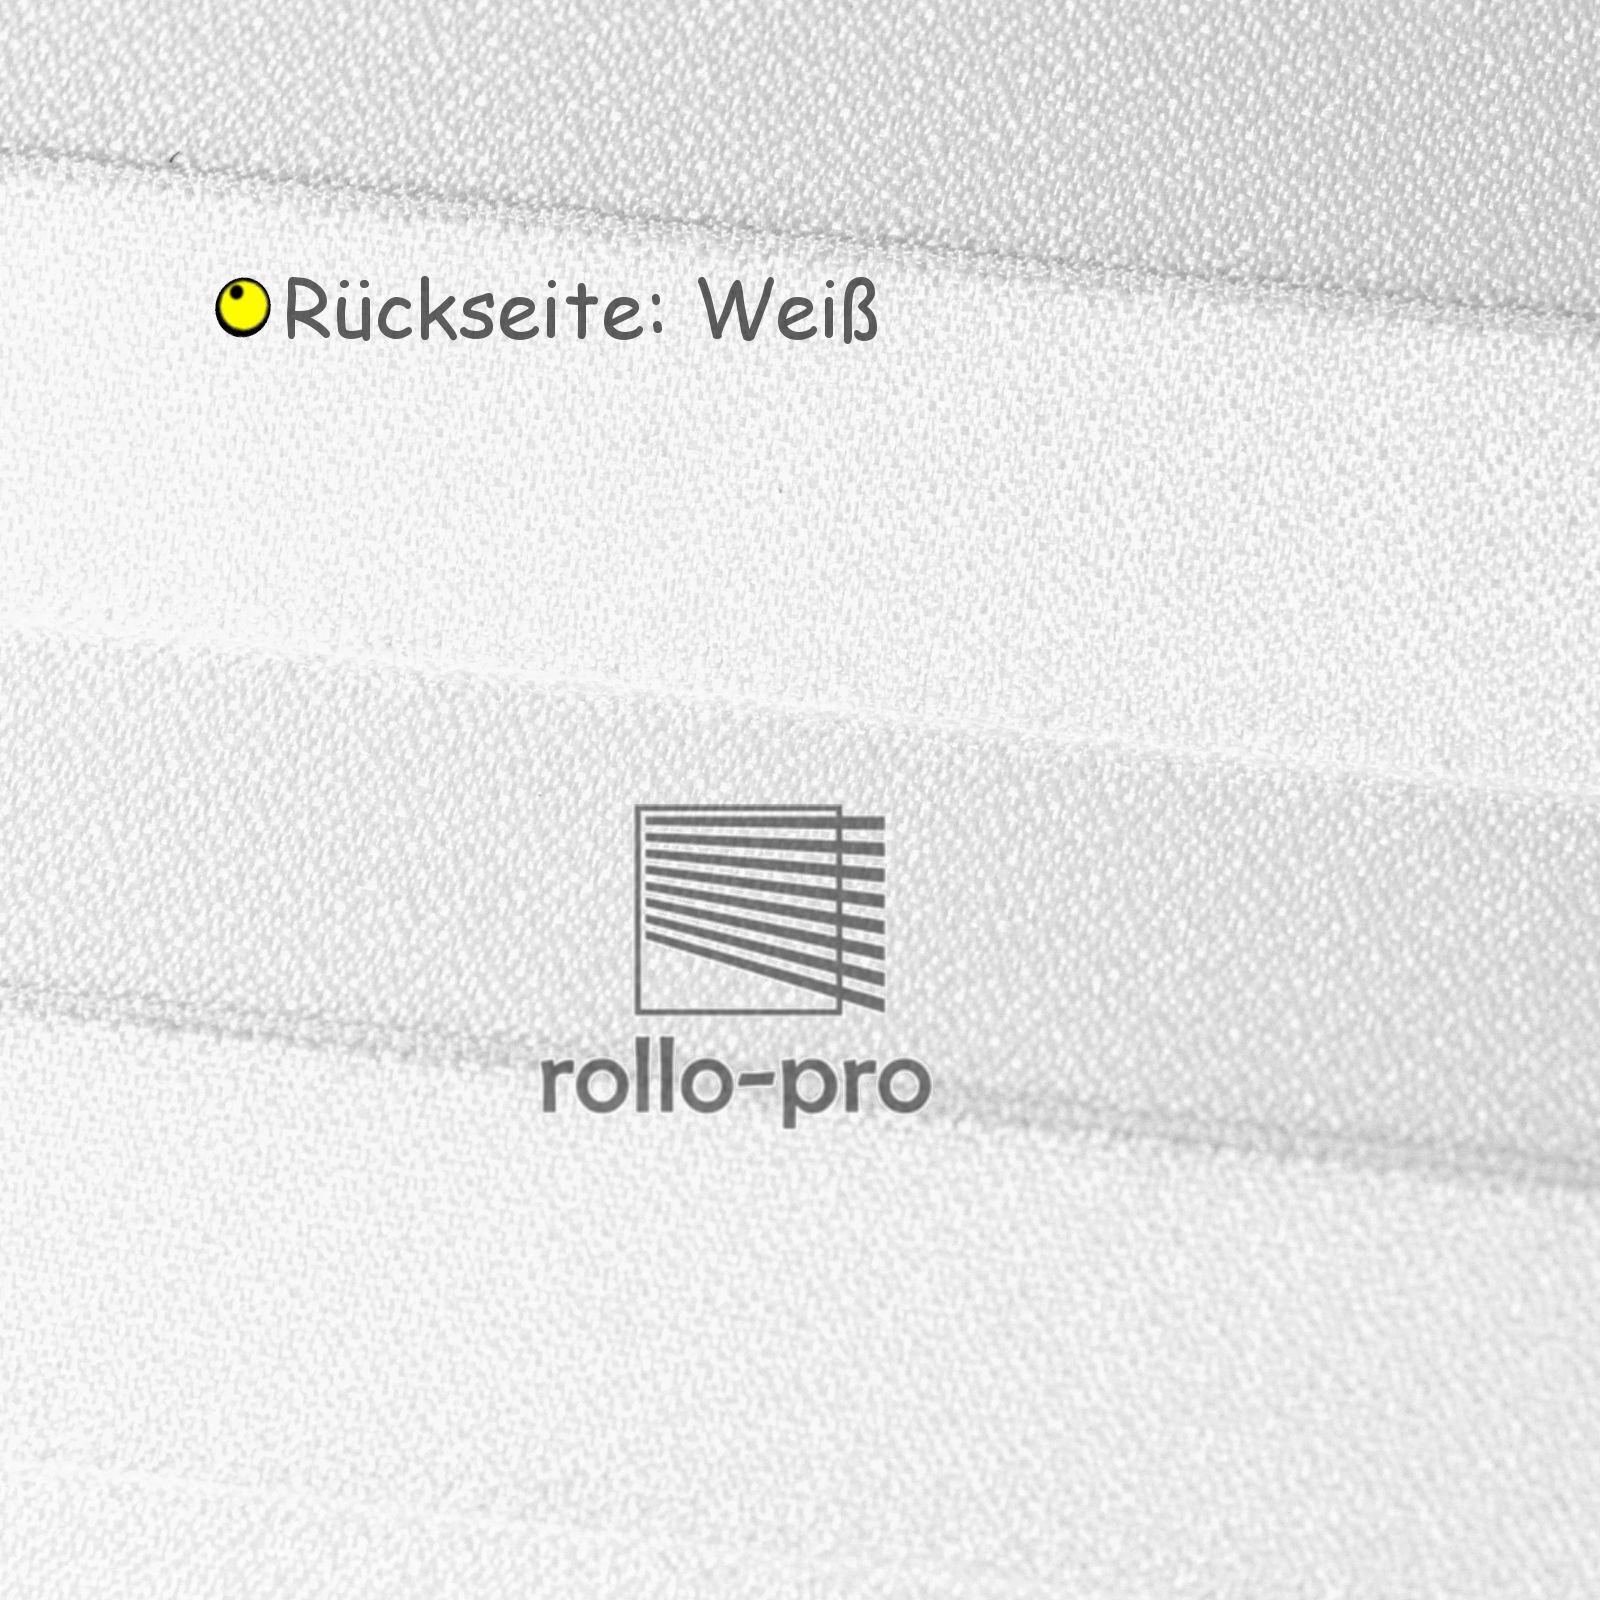 Plissee Faltrollo Faltrollo Faltrollo ohne Bohren   Plisee nach Maß   Klemmfix   ATURI   Profil Weiß 74eb94